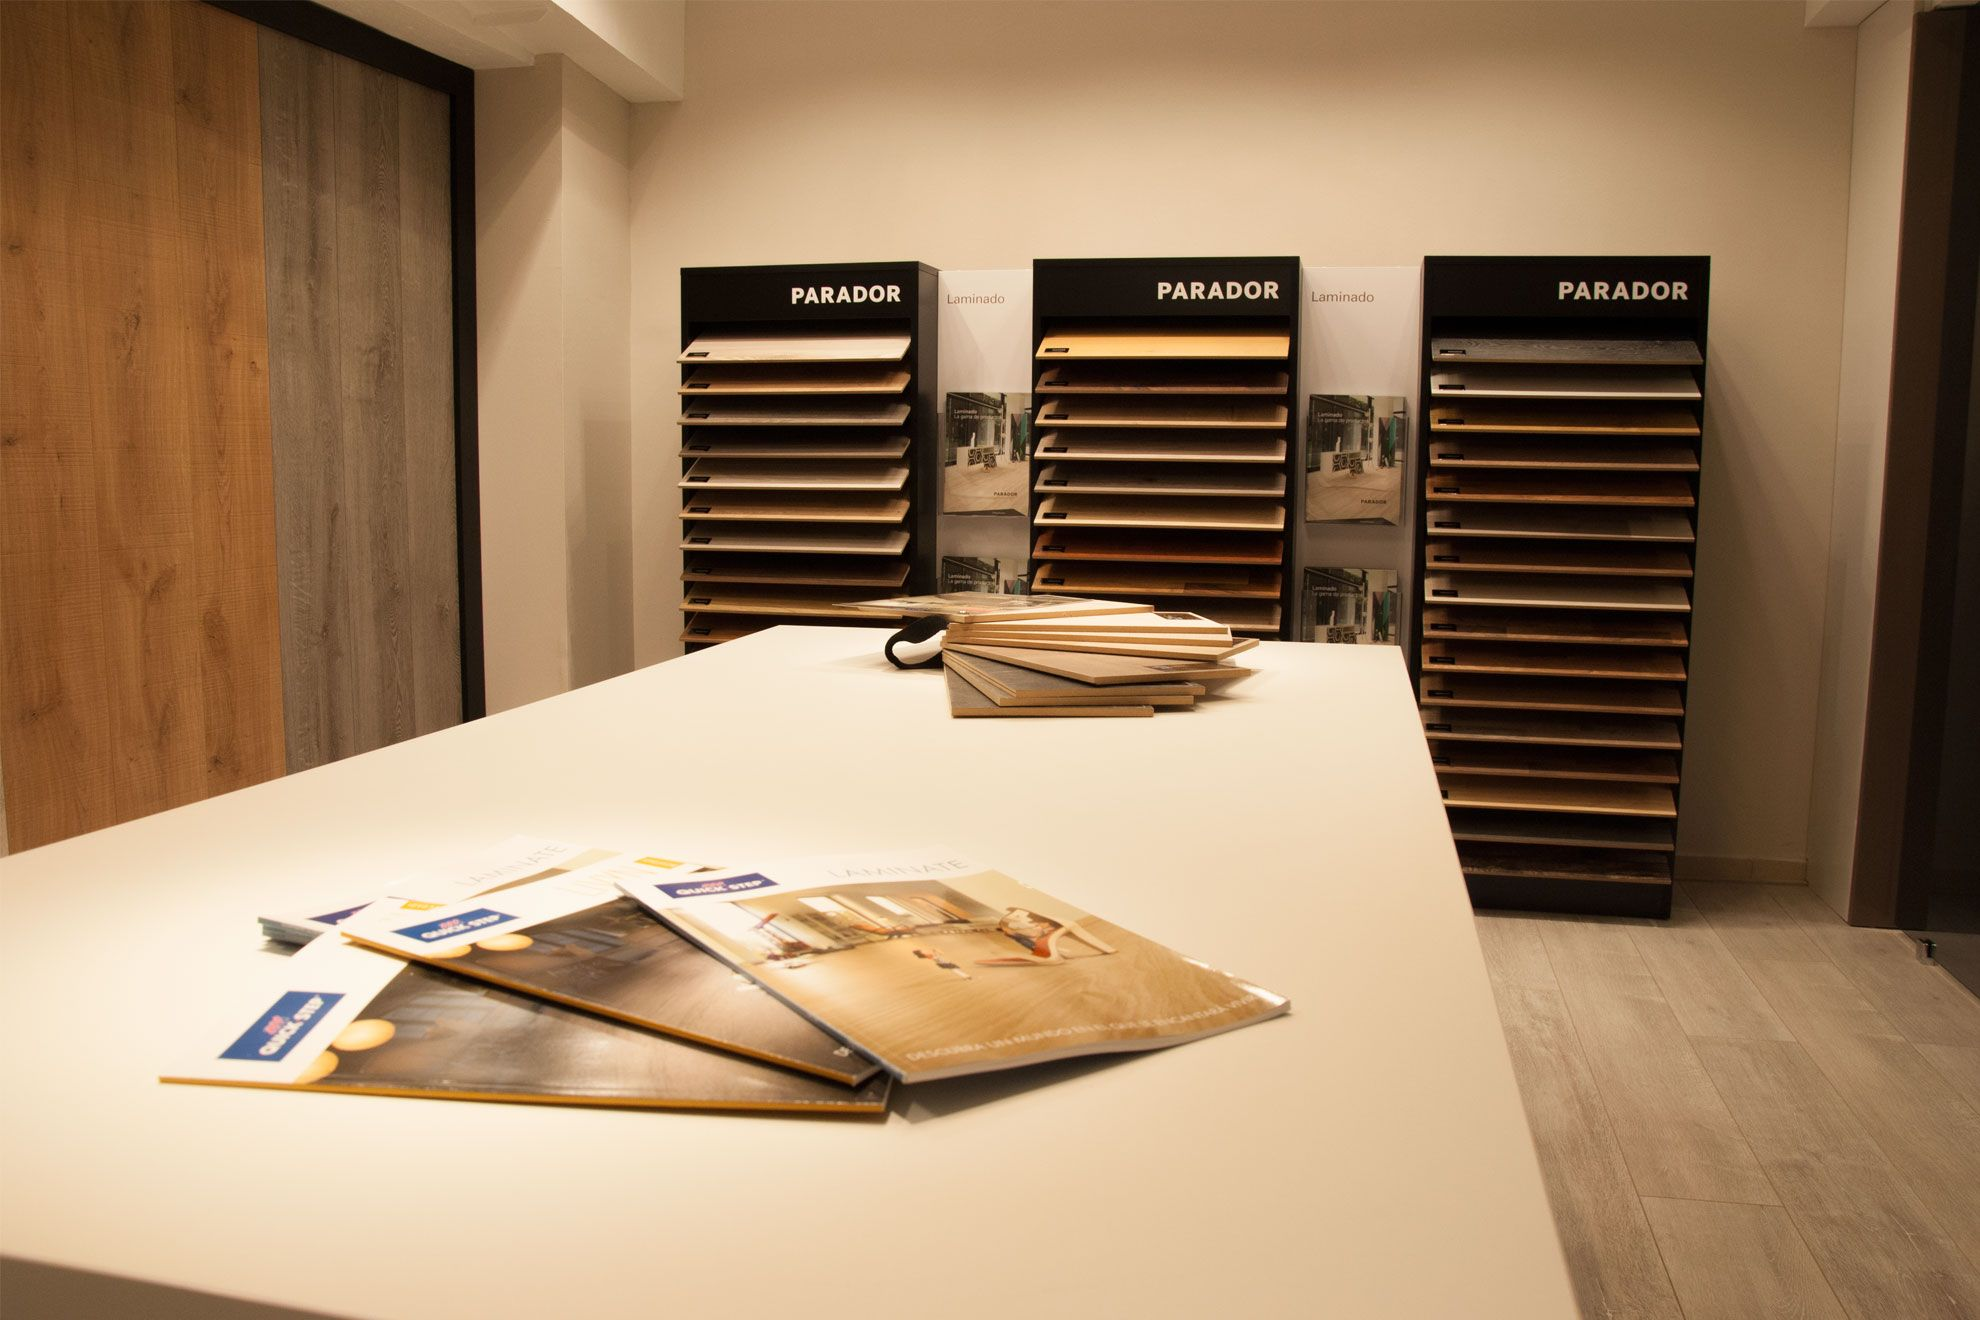 Hermosa Salas De Exposición De Diseño De Cocina Chicago Adorno ...